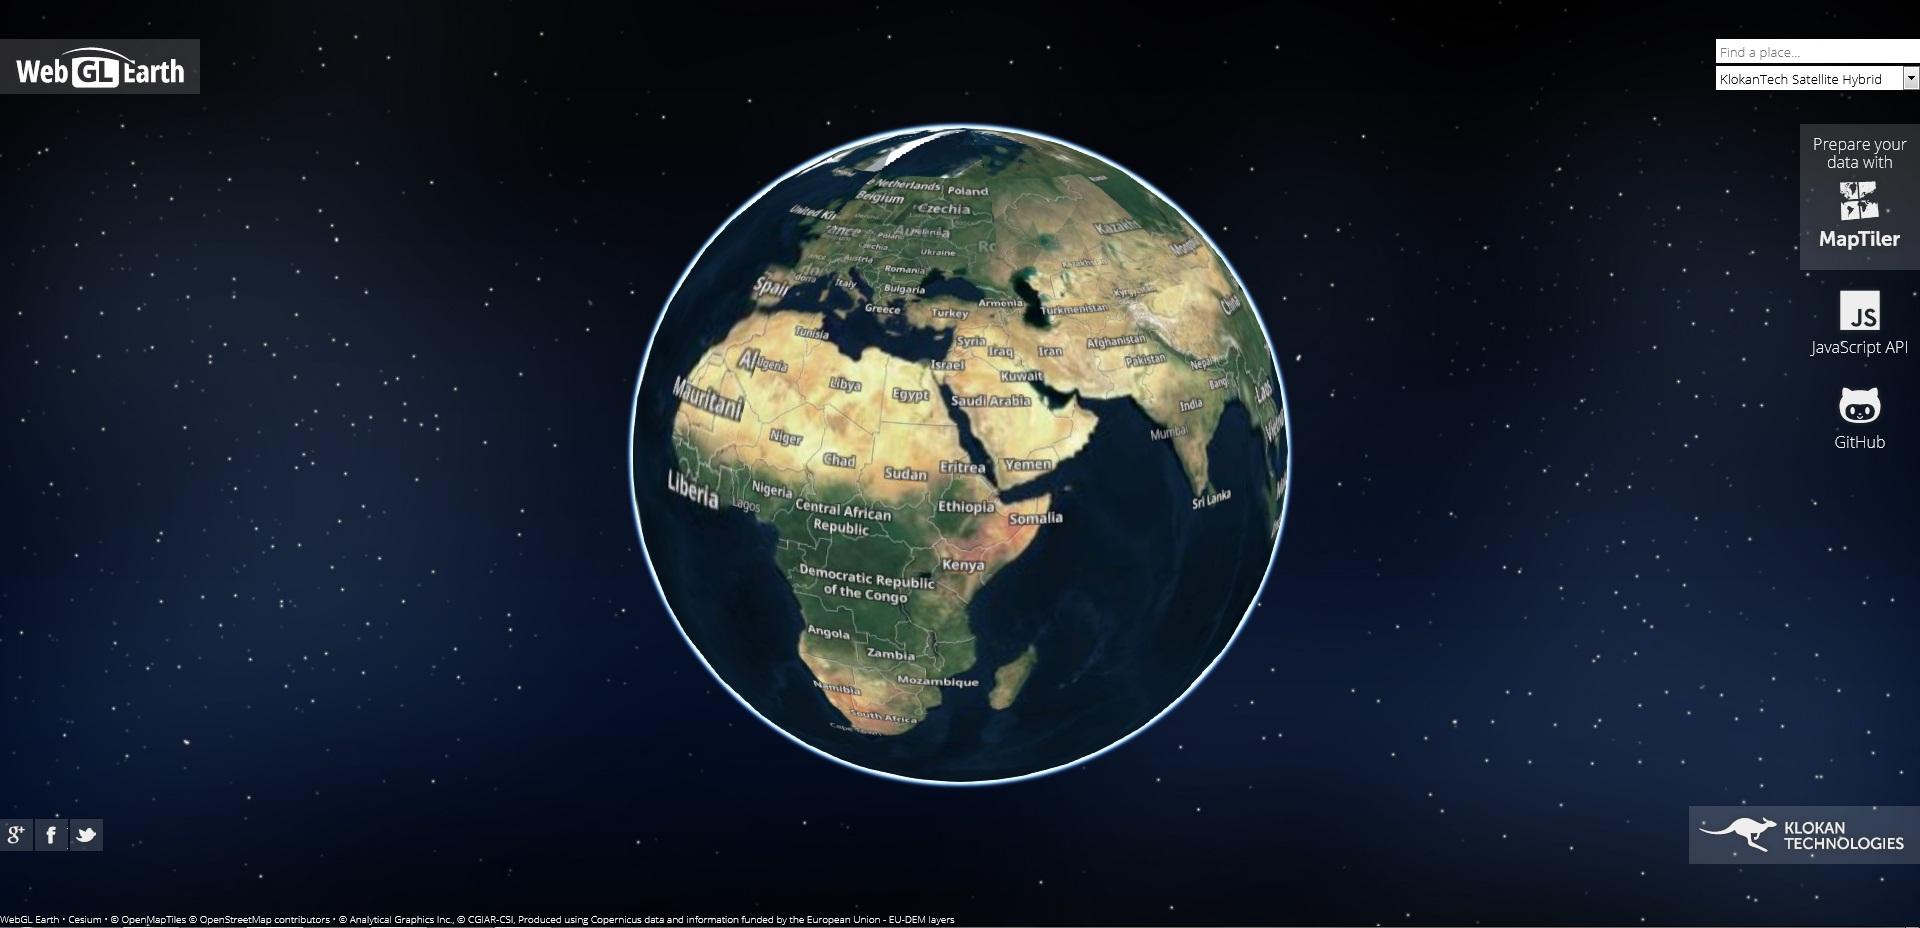 Онлайн глобус www.webglearth